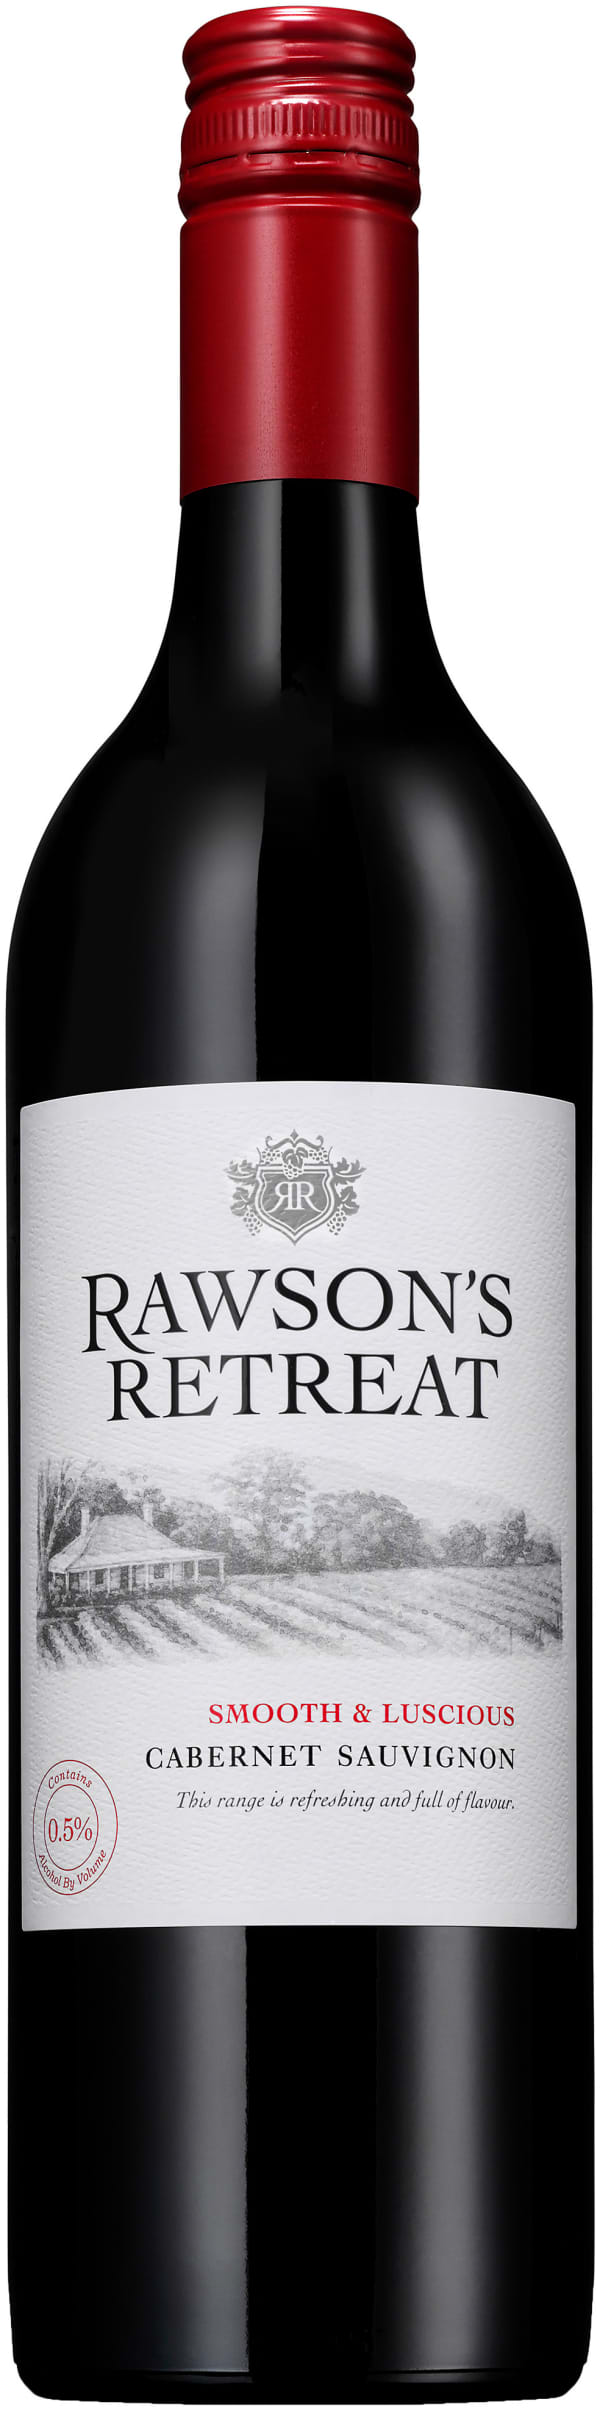 Rawson's Retreat Low Alcohol Cabernet Sauvignon